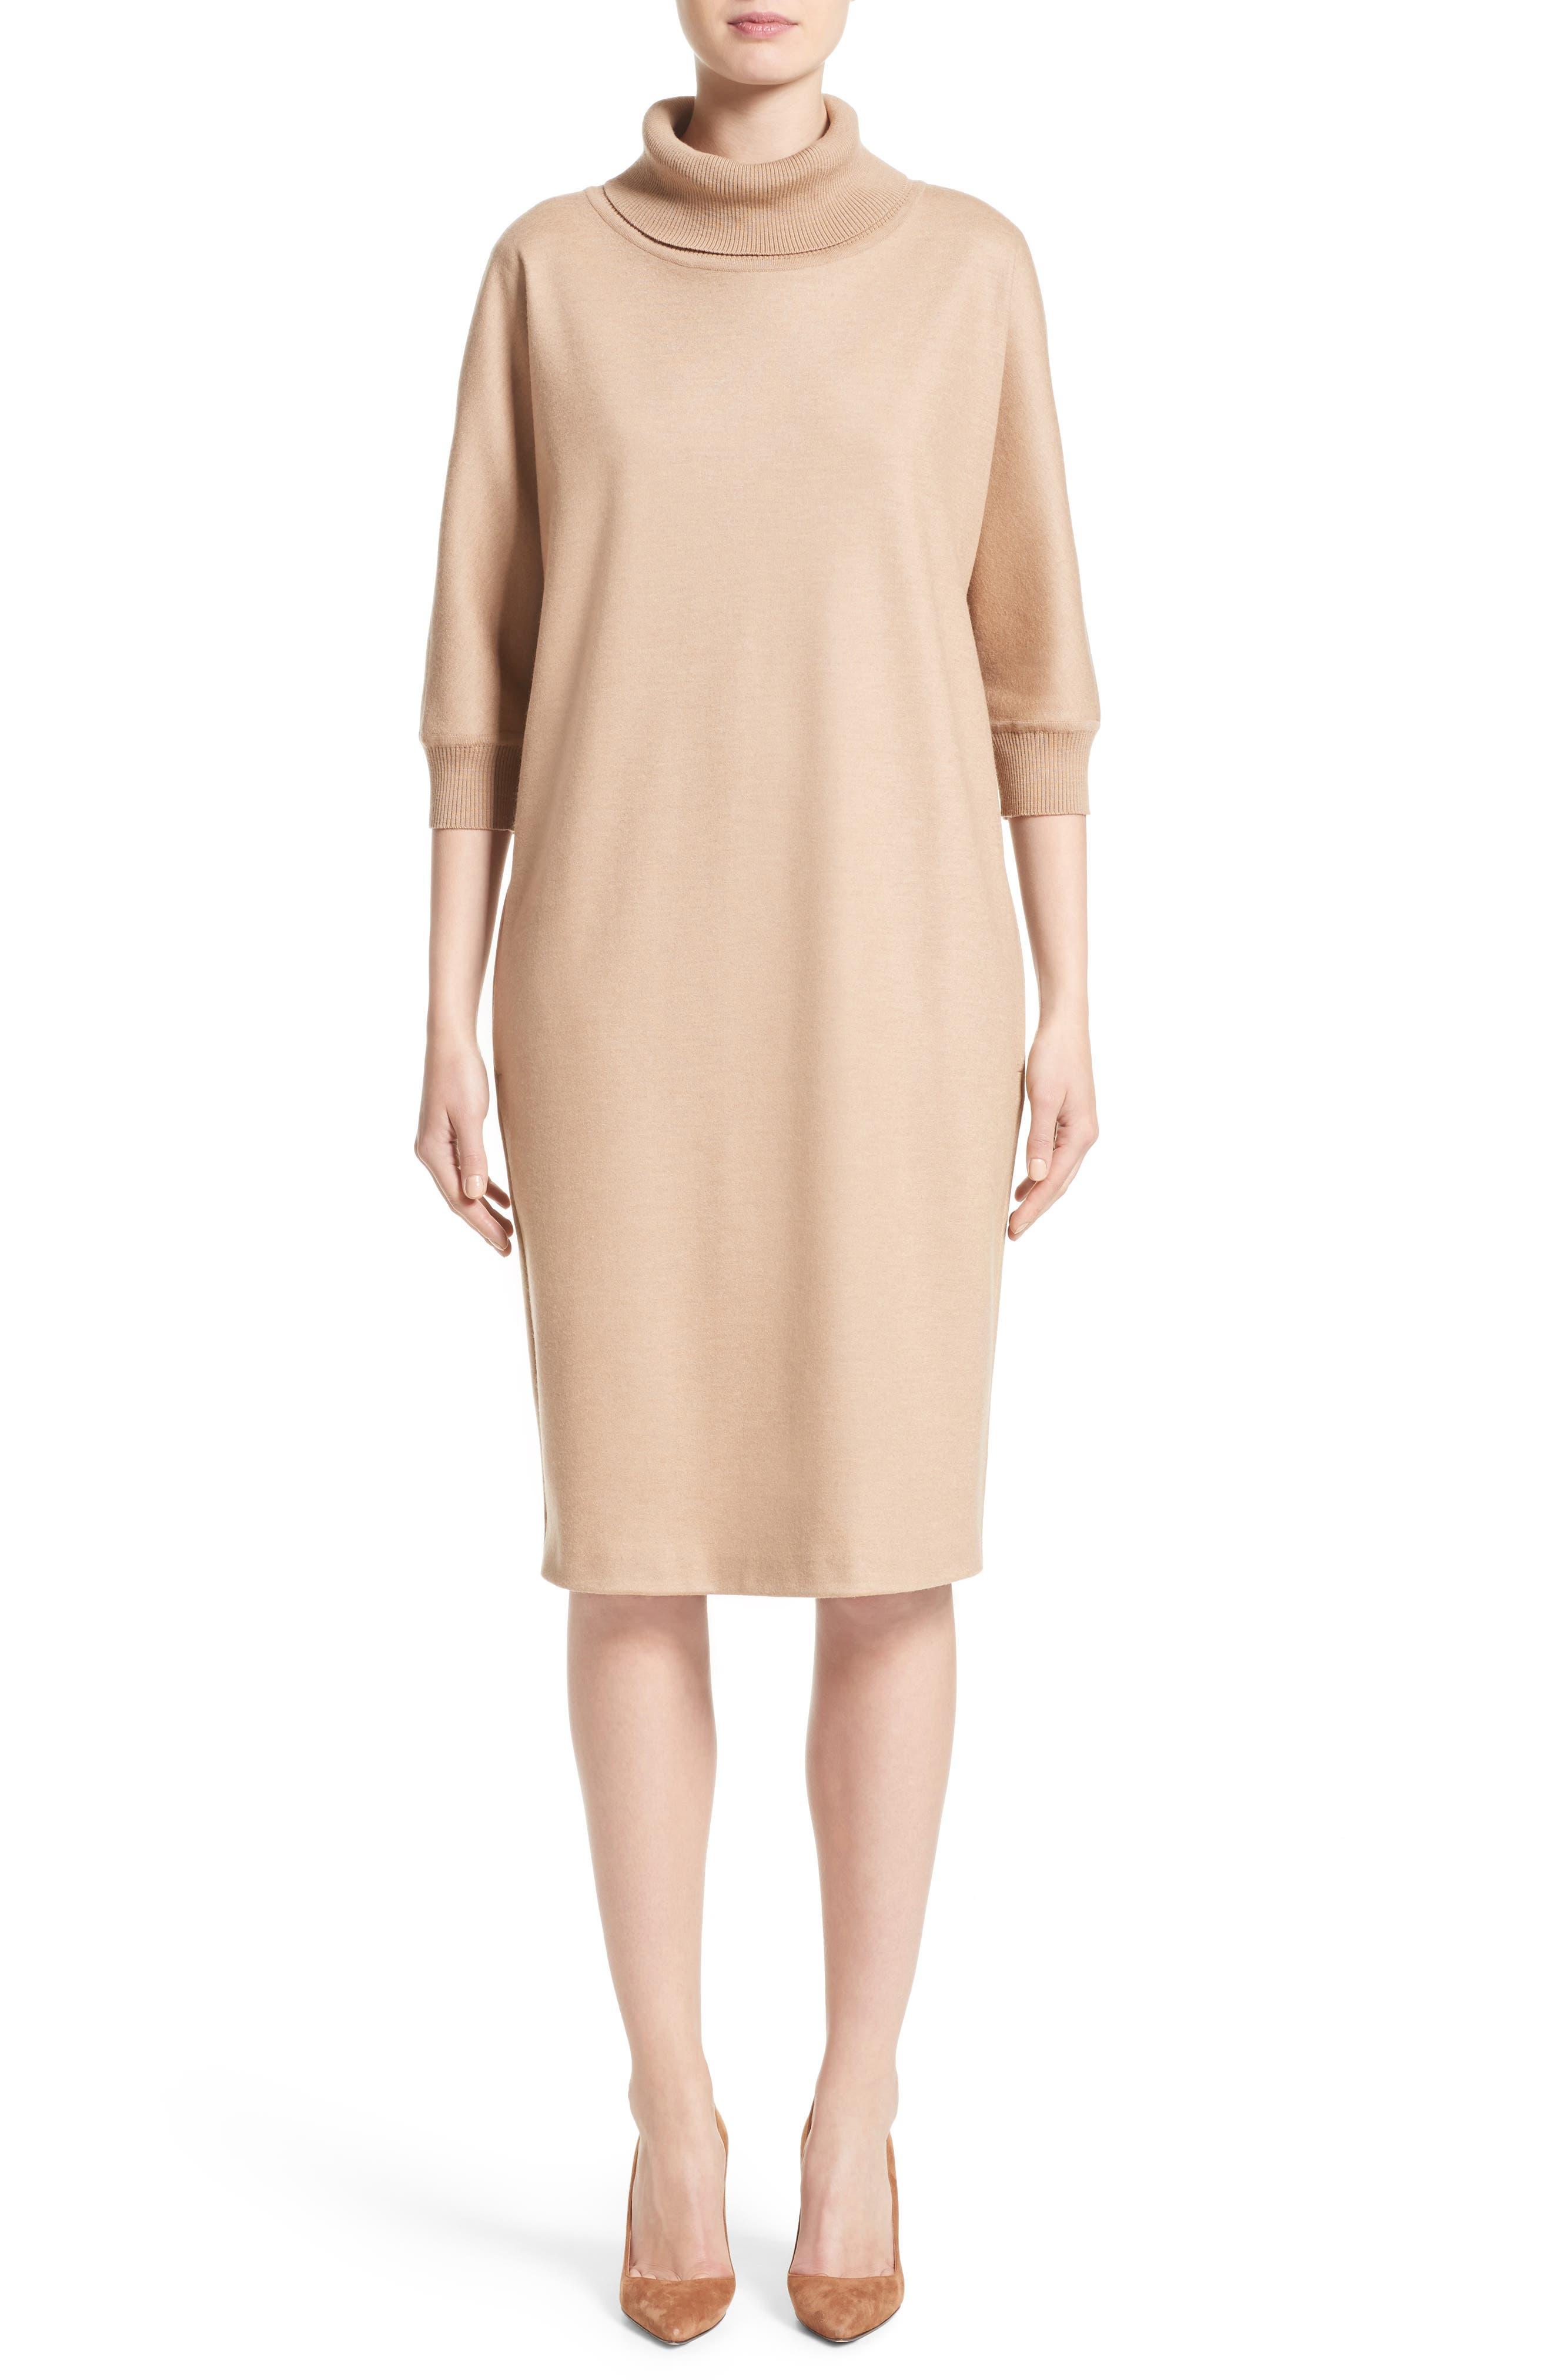 Max Mara Agro Wool Turtleneck Dress